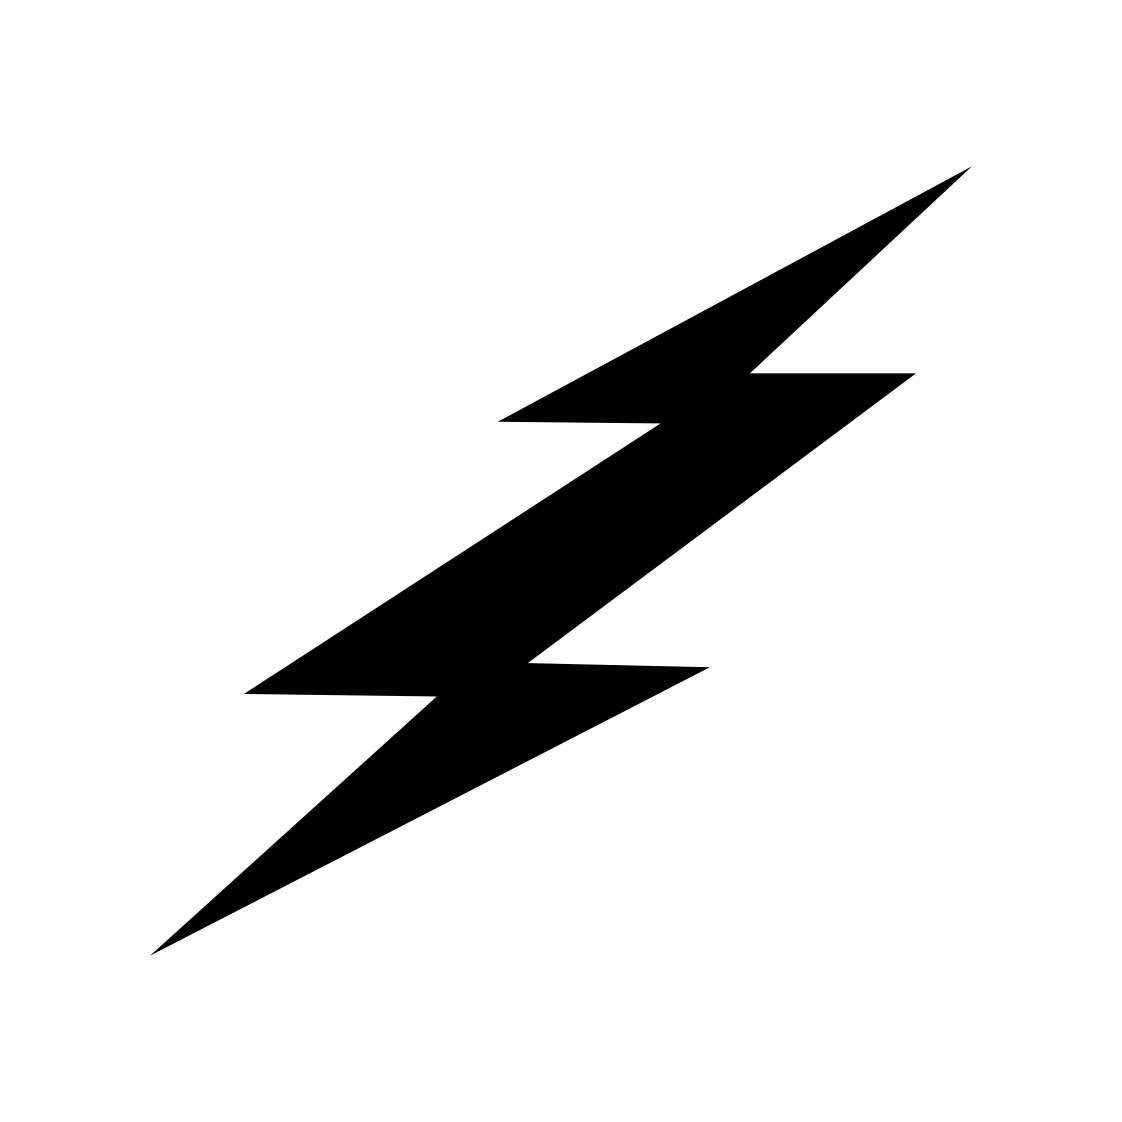 Green lighting bolt clip art vector clip art online royalty - Harry Potter Lightning Bolt Magic Graphics Svg Dxf Eps Png Cdr Ai Pdf Vector Art Clipart